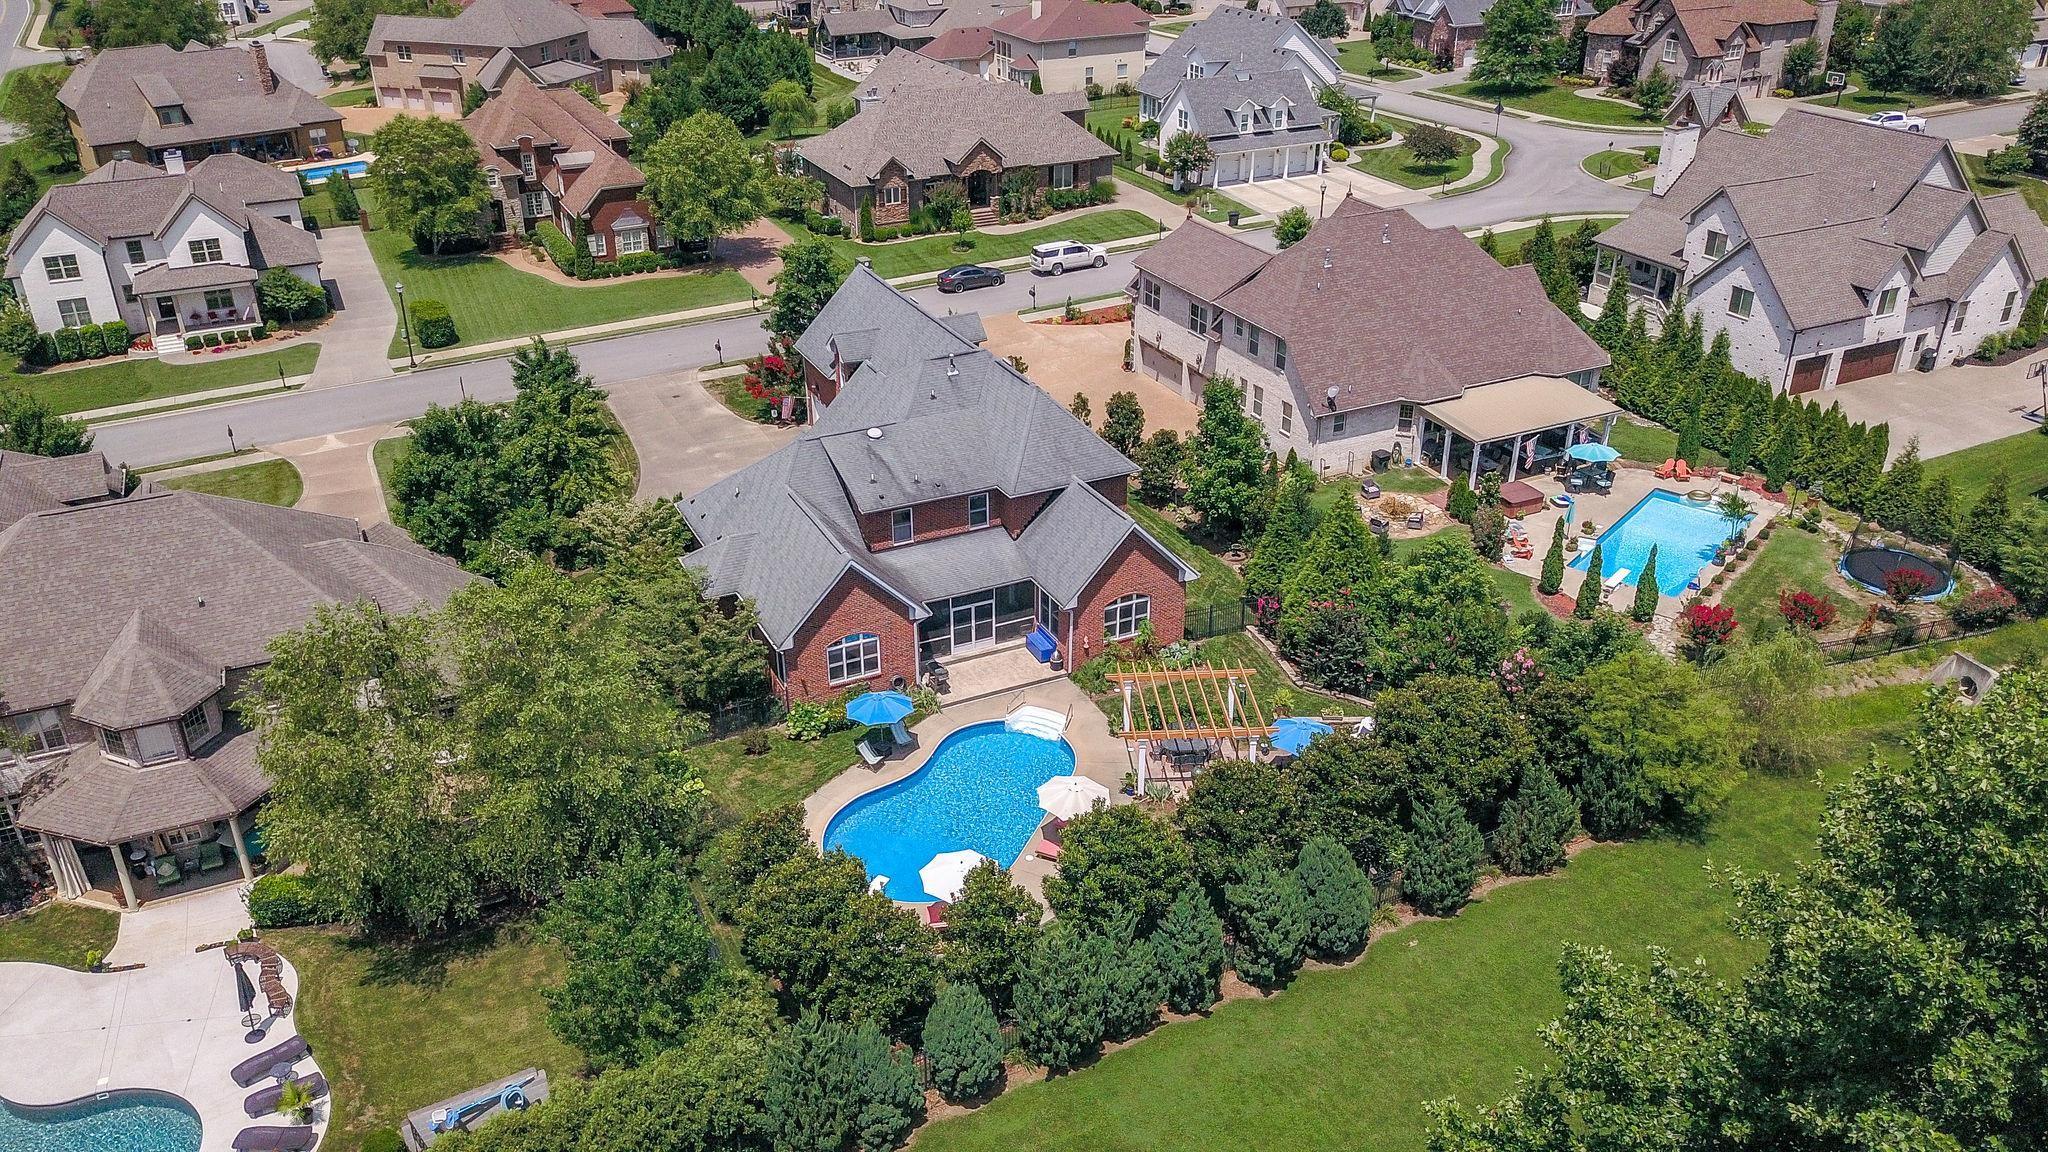 $699,900 - 4Br/5Ba -  for Sale in Drakes Pointe, Hendersonville